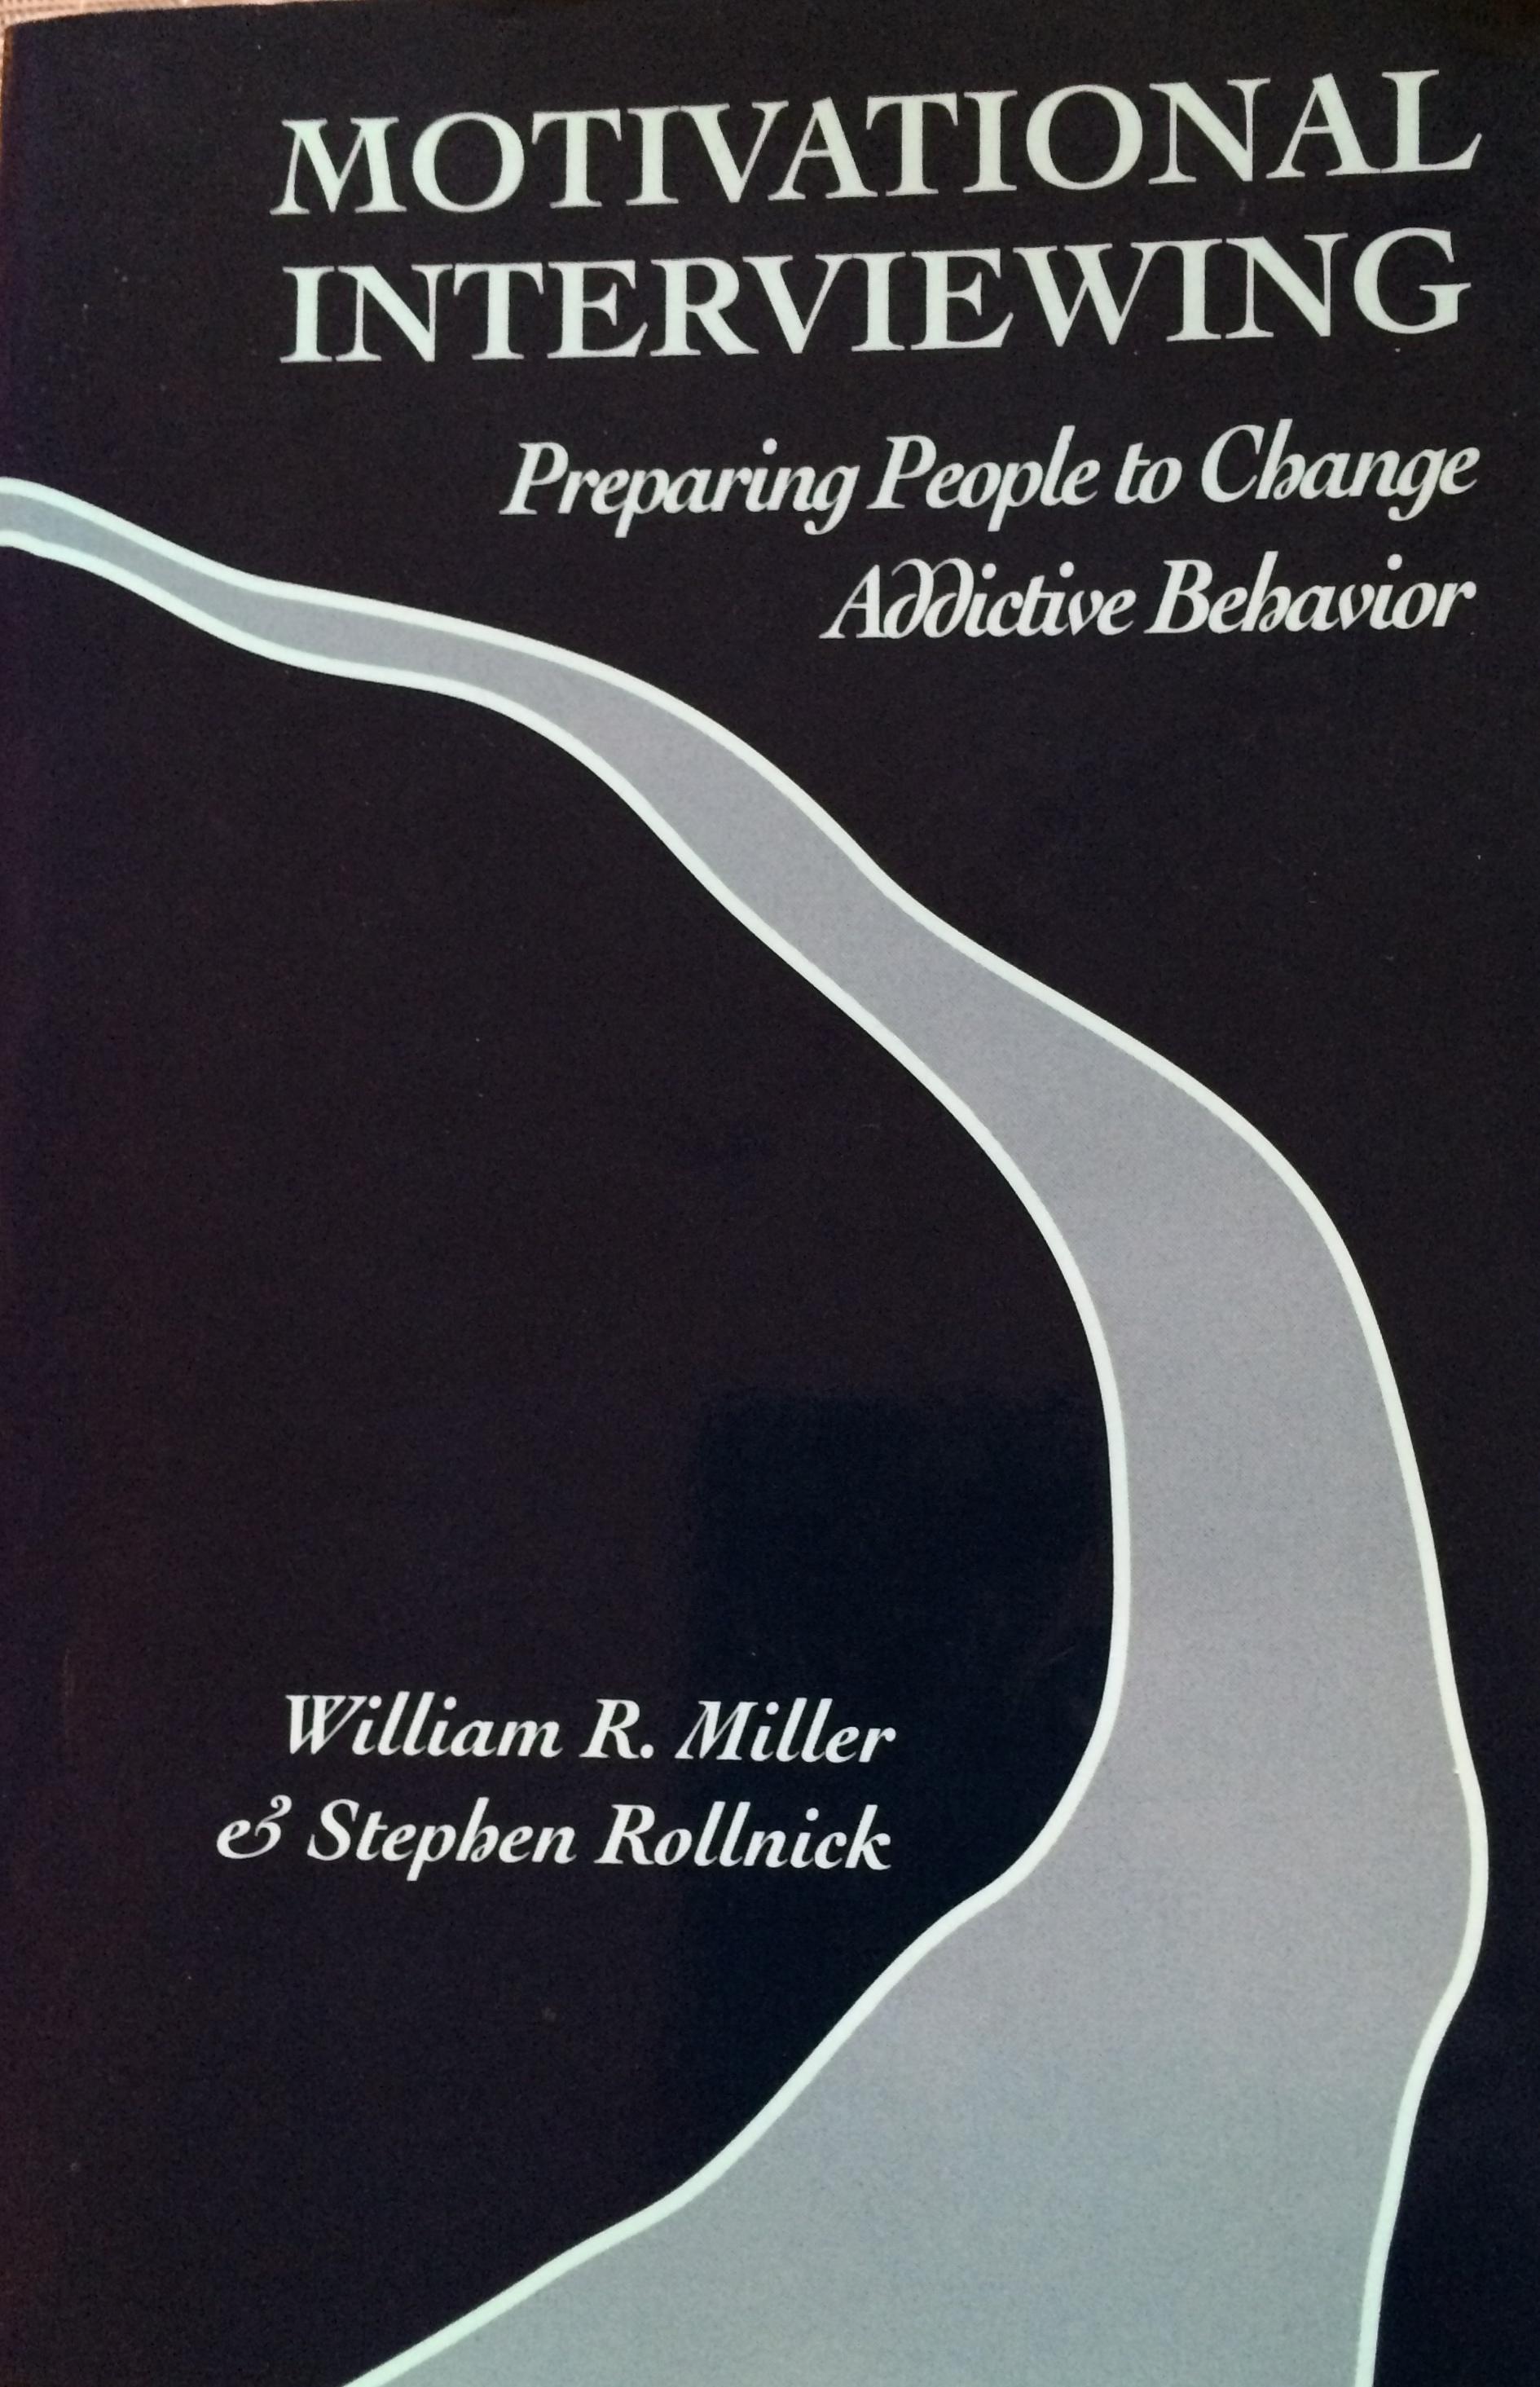 books merrick mediation books motivational interviewing a mediator tool to help ambivalent parties